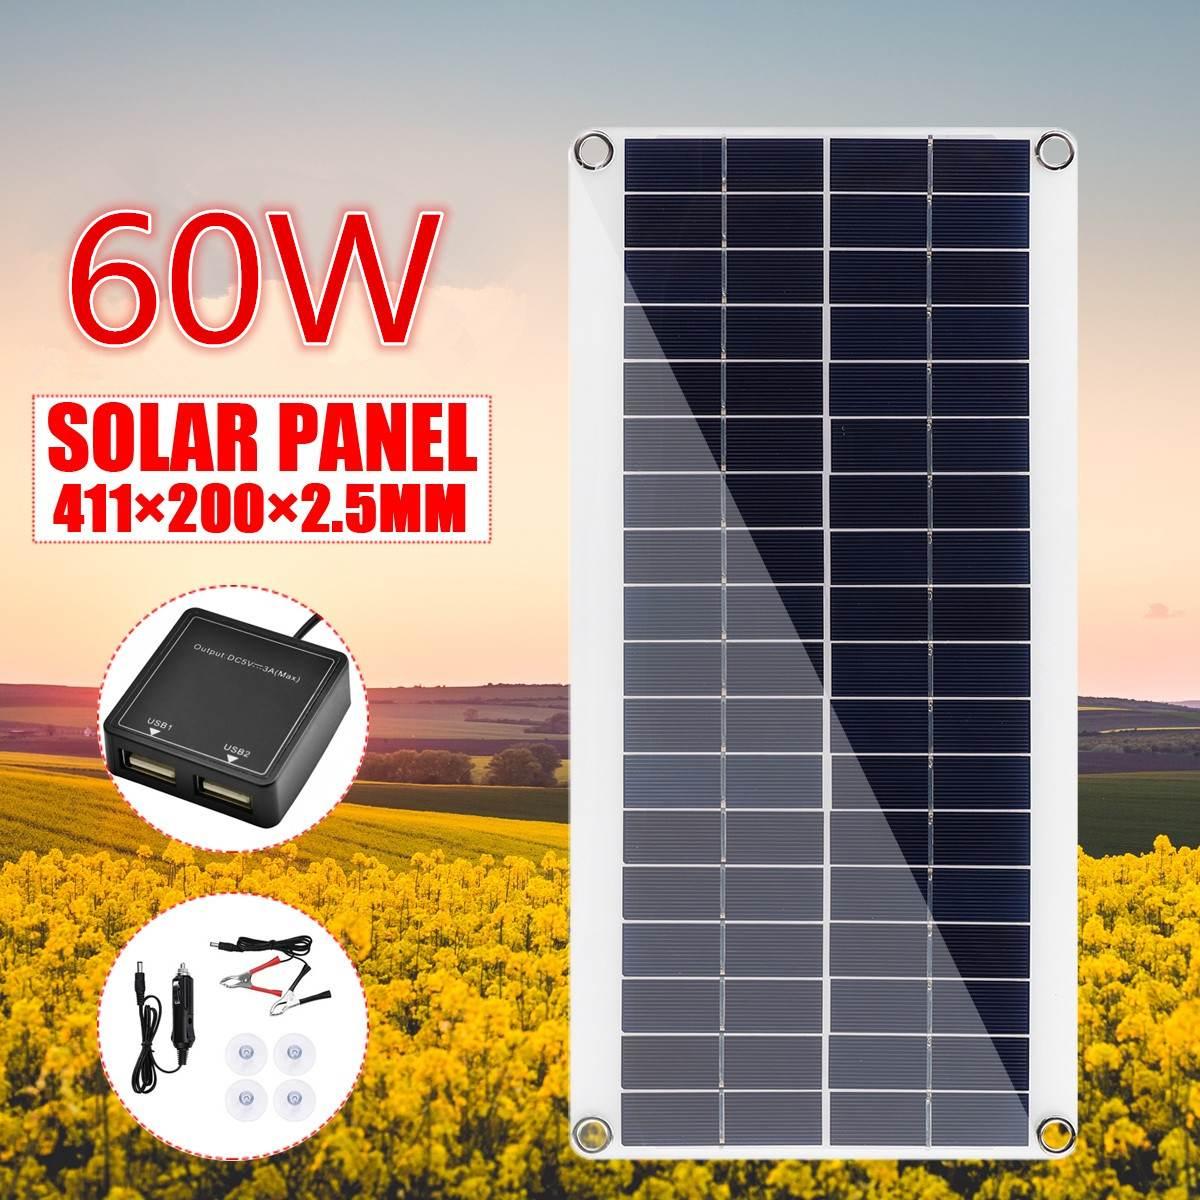 60W CC 18V Panel Solar portátil batería Cargador Solar para teléfono placa cocodrilo Clips cargador de coche para teléfono RV coche 411X200X2,5 MM